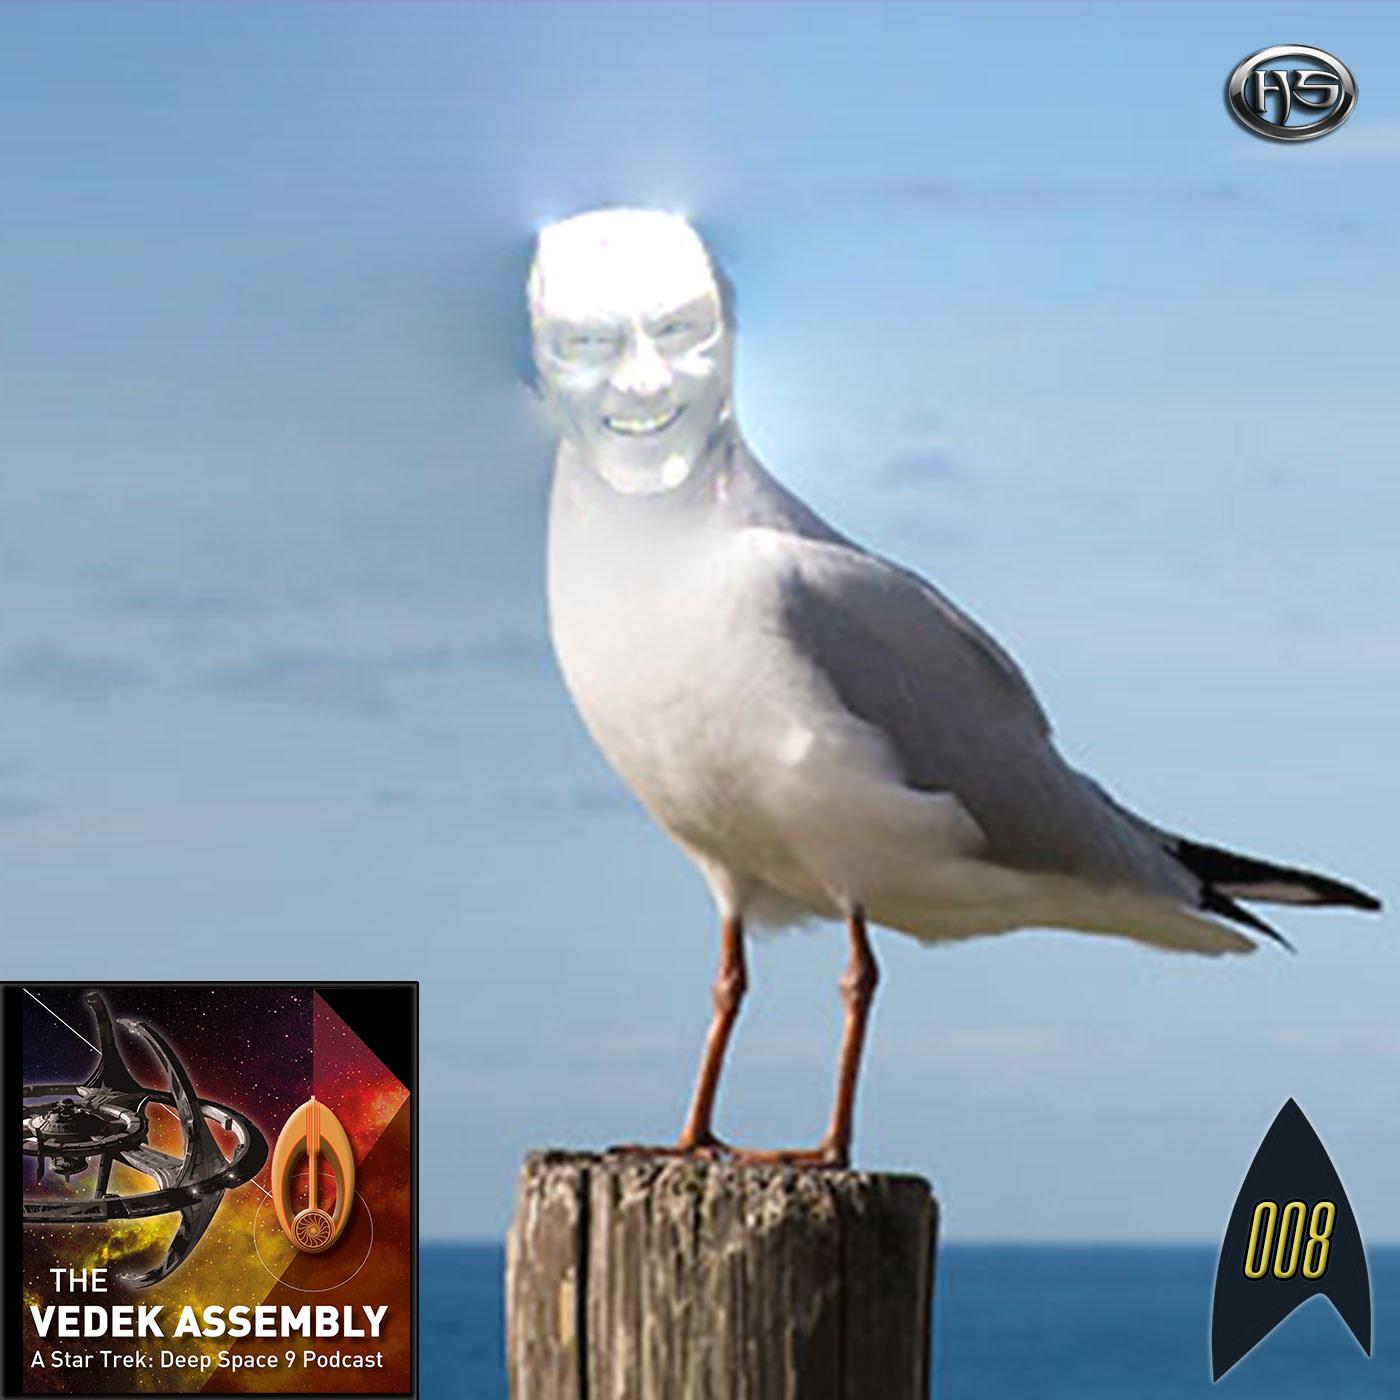 The Vedek Assembly Episode 8